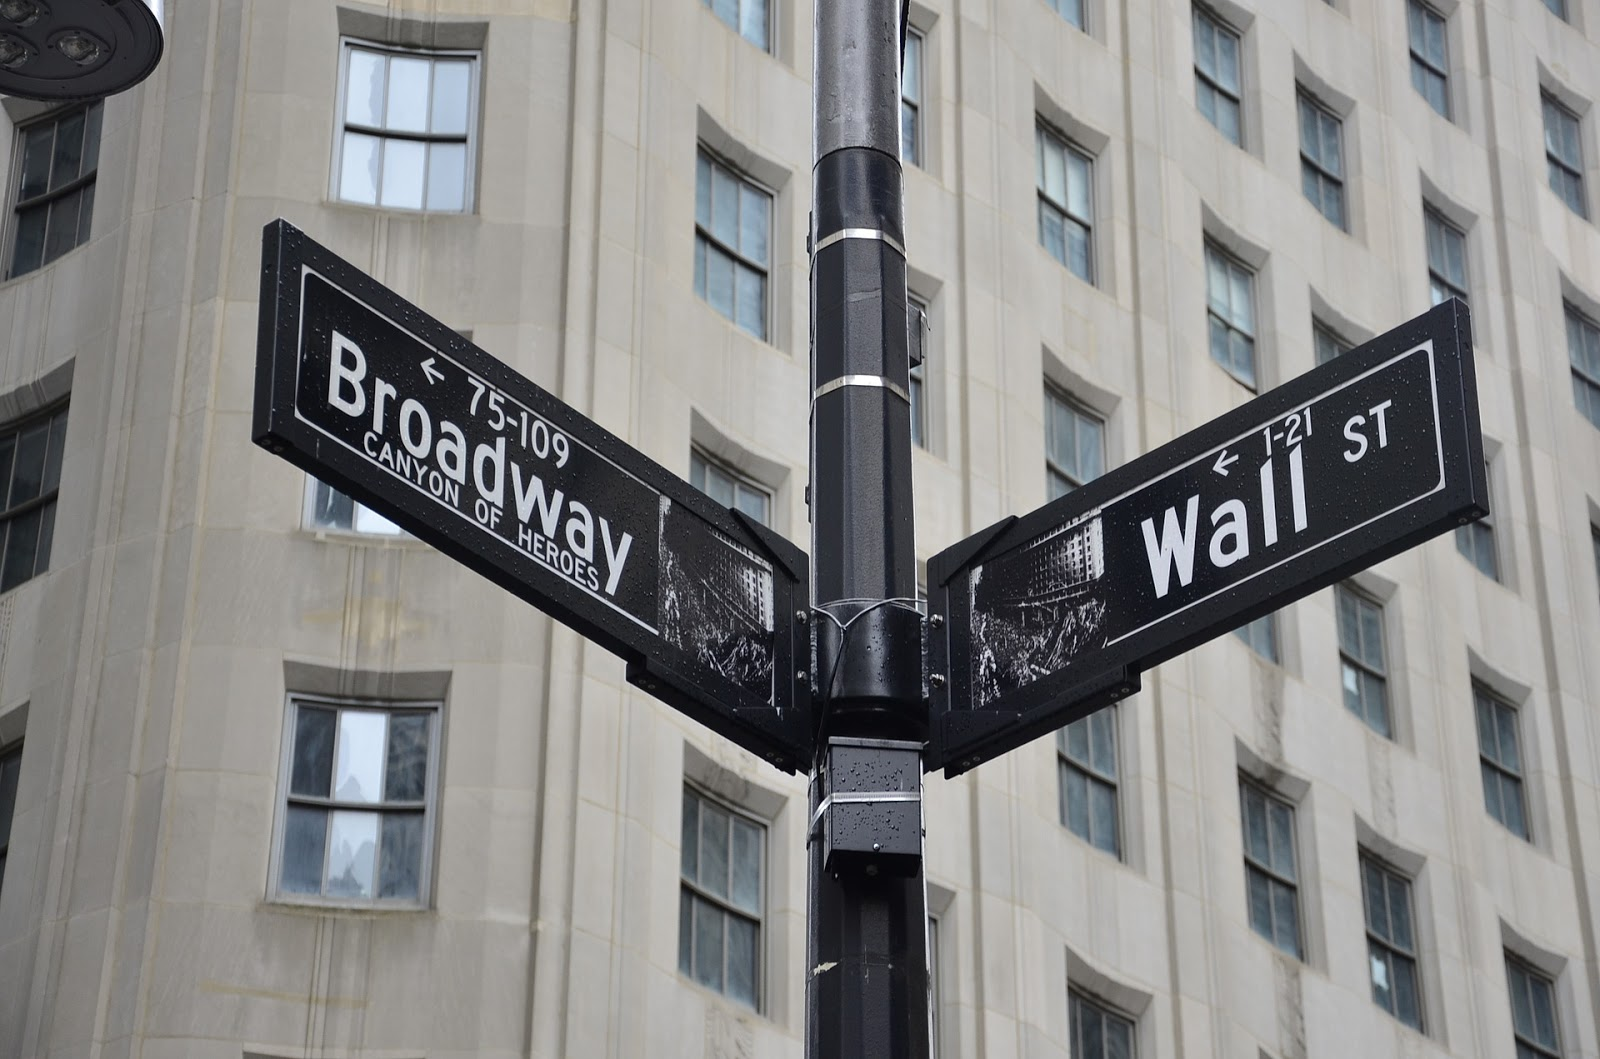 Broadway, New York City USA